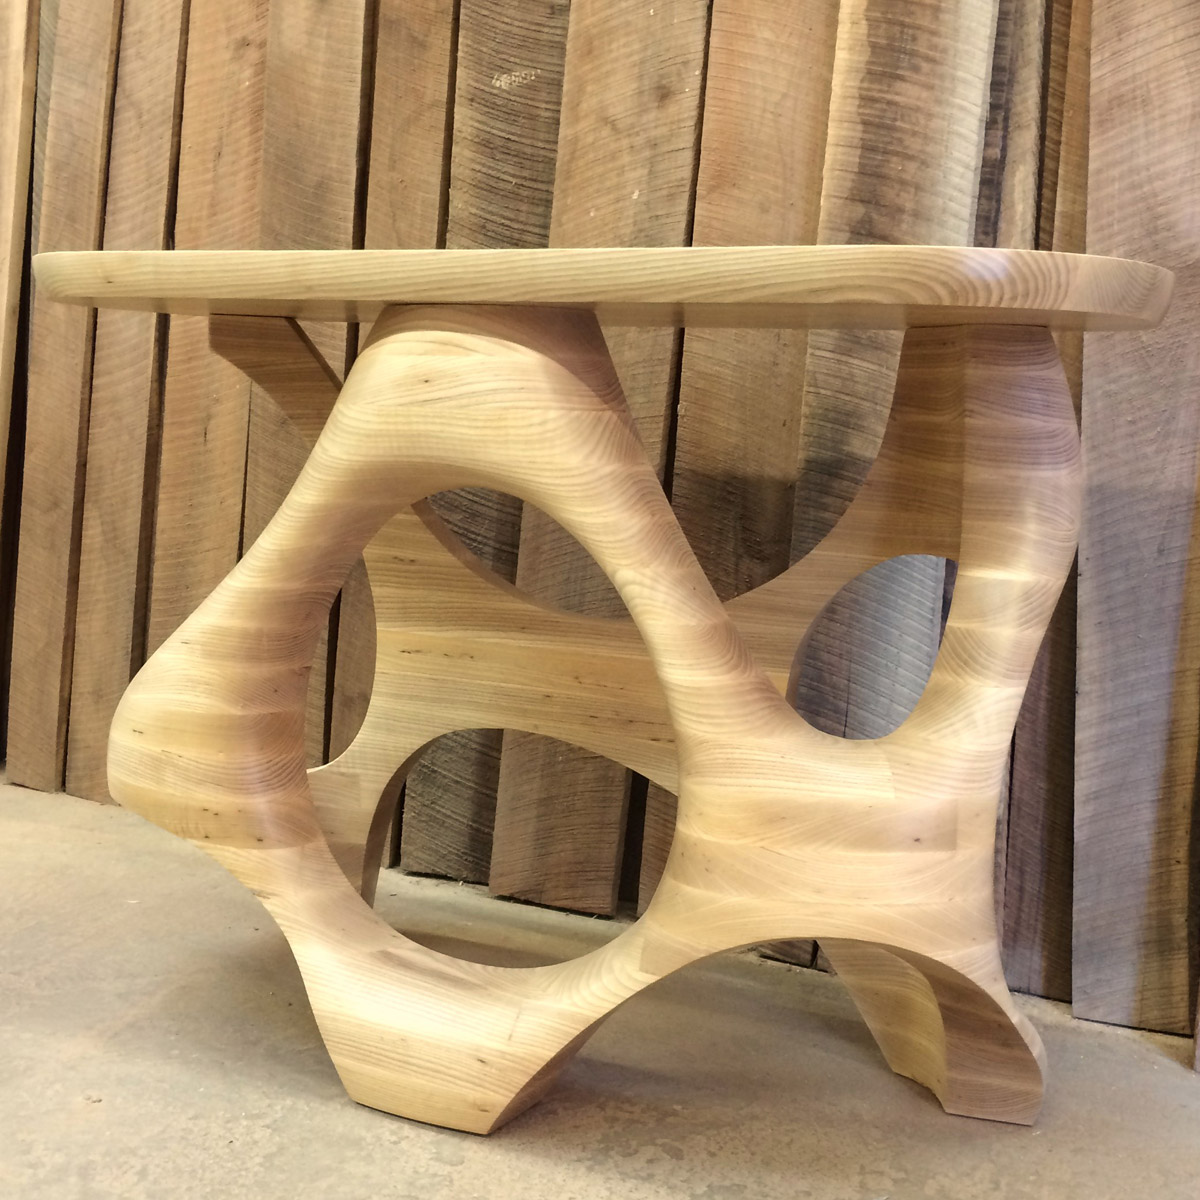 Caleb-Woodard-Lissome-Side-Table_3.jpg